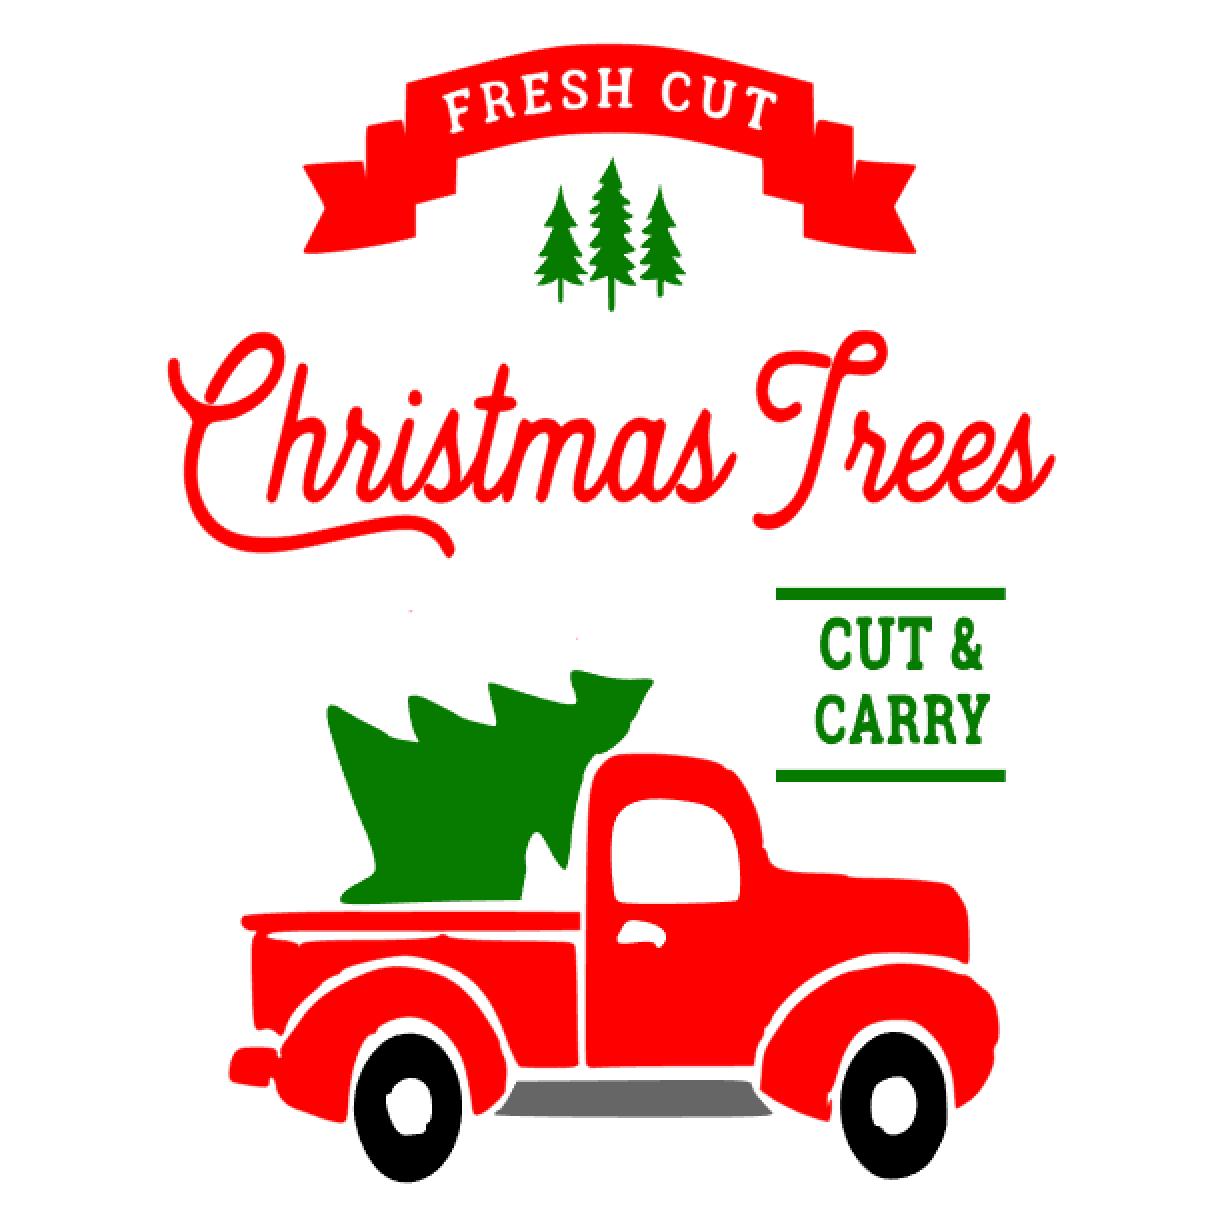 Christmas Tree + Truck